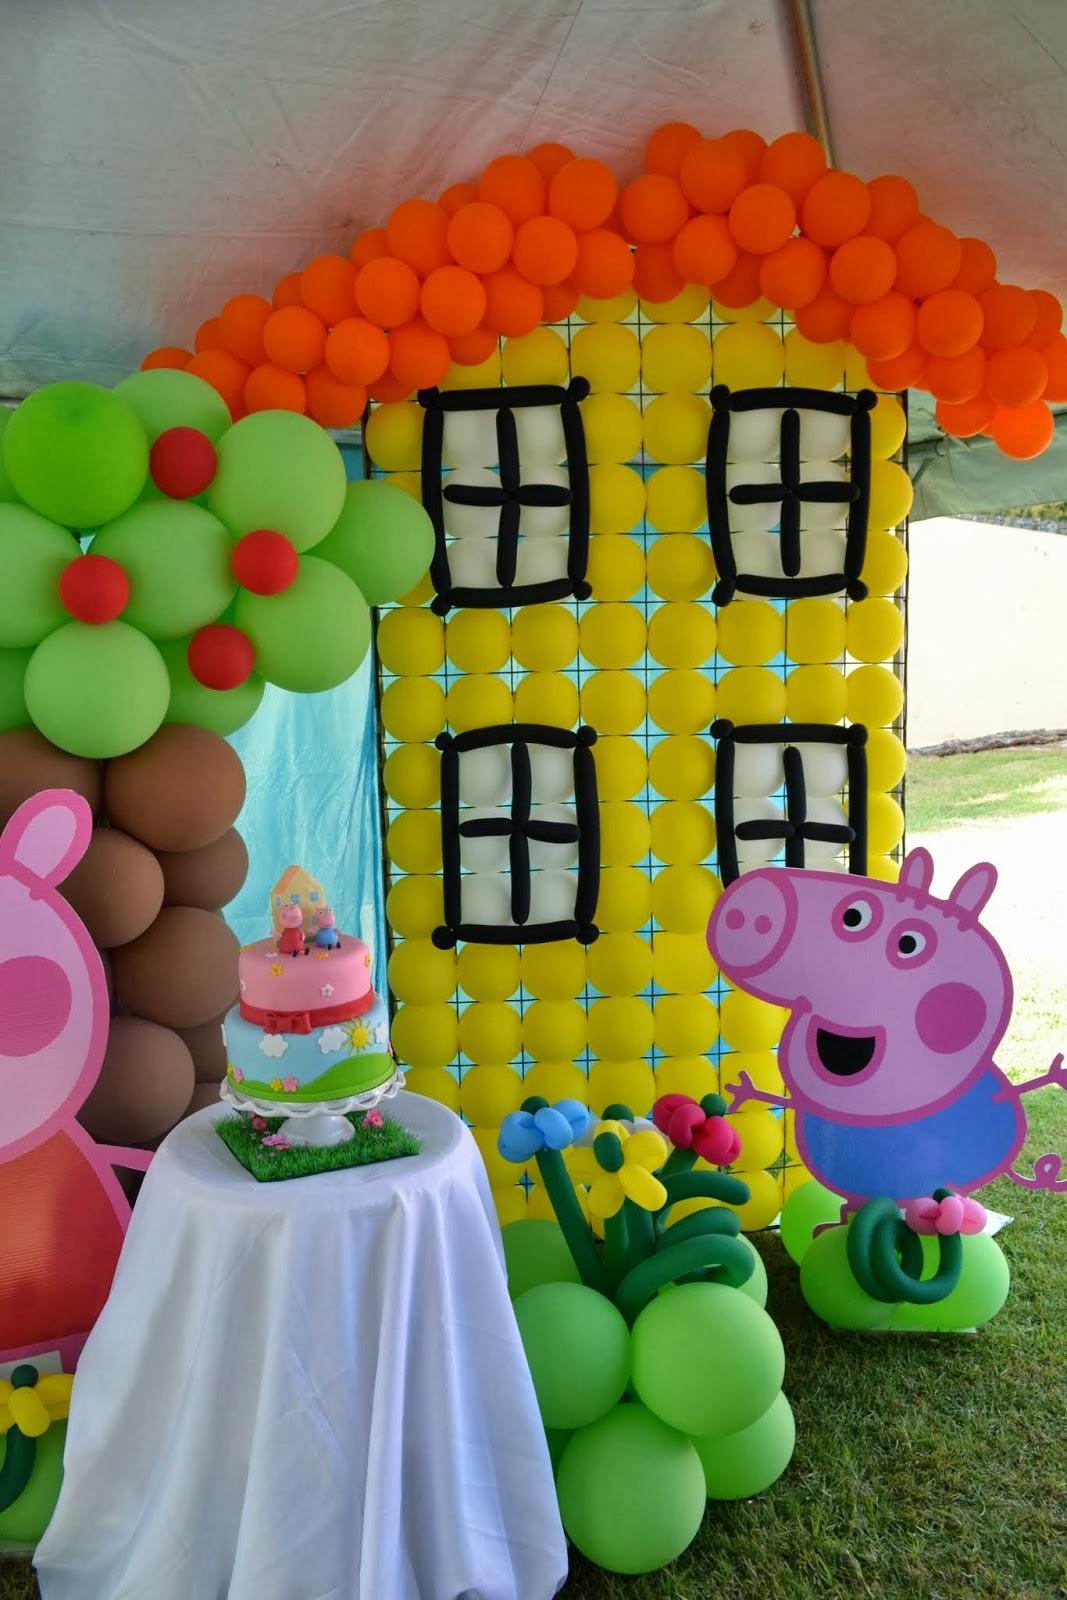 Decoracion de fiestas infantiles peppa pig - Decoracion fiestas infantiles en casa ...